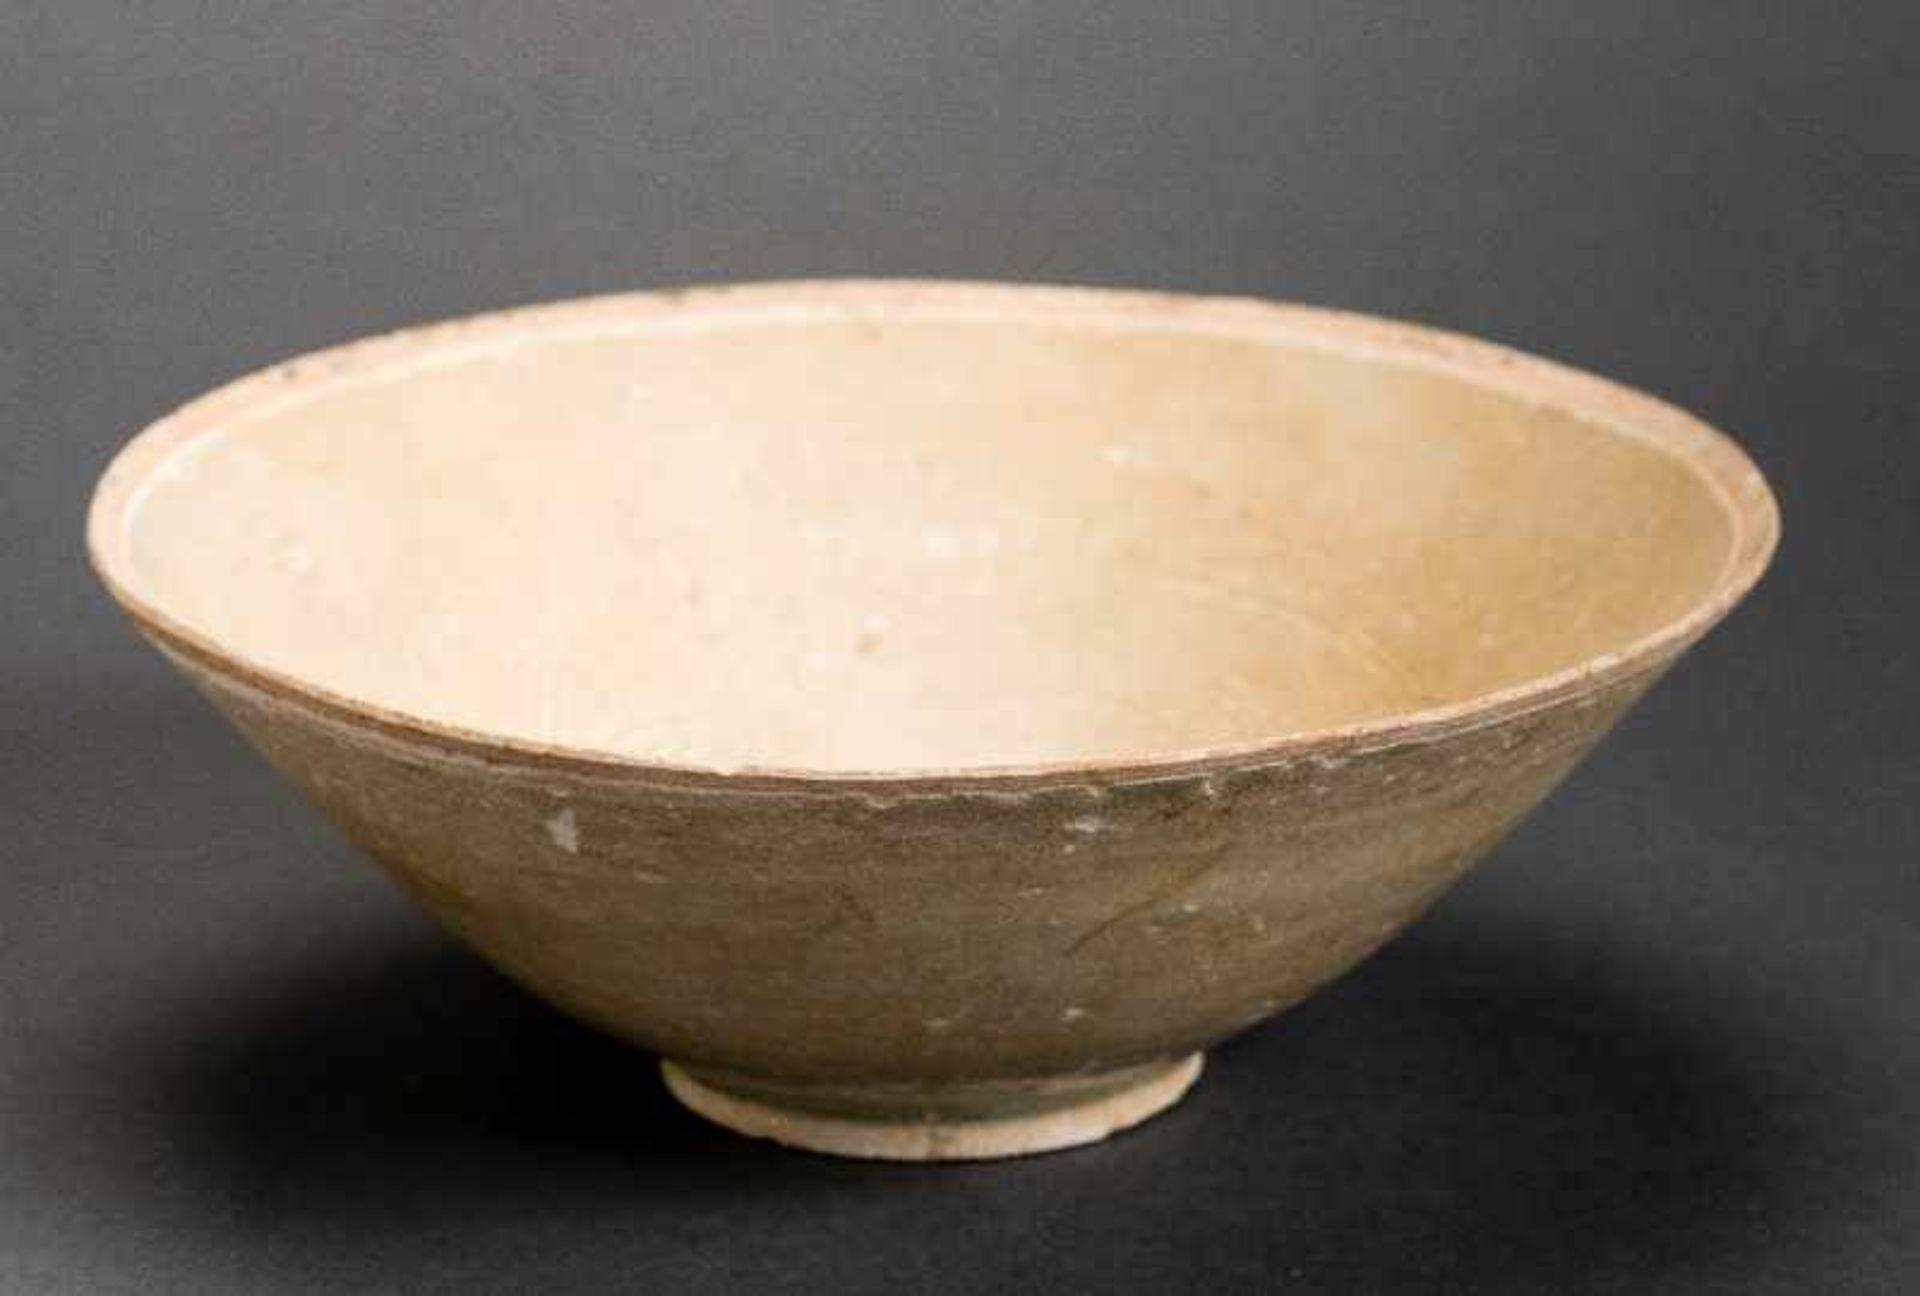 TIEFE SCHALEGlasierte Keramik. China, Song, ca. 12. bis 13. Jh. Diese trichterförmige tiefe Schale - Image 6 of 6